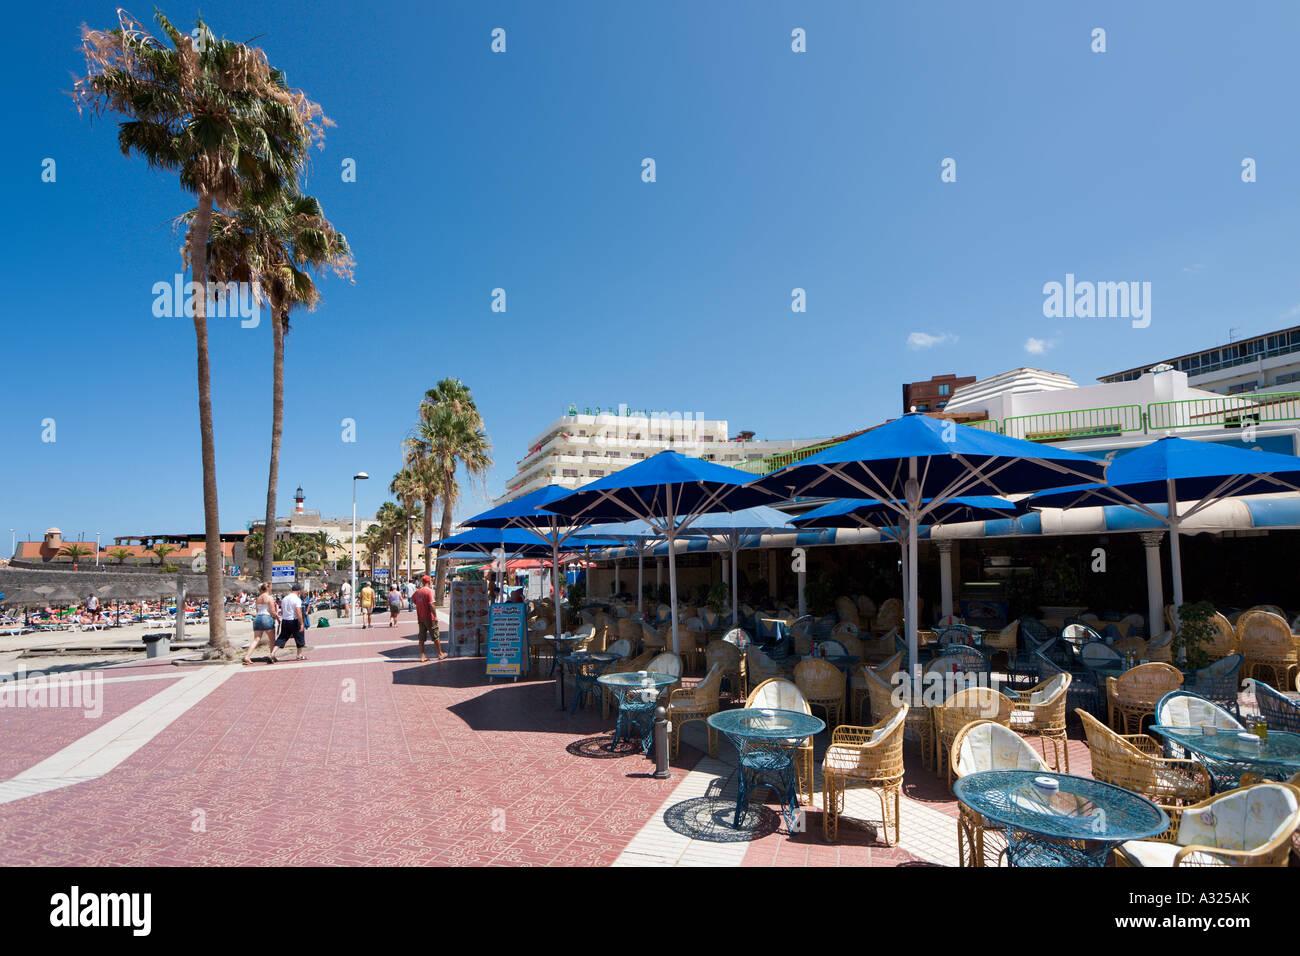 Direkt am Strand-Cafés, Playa De La Pinta, Costa Adeje, Playa de las Americas, Teneriffa, Kanarische Inseln, Stockbild